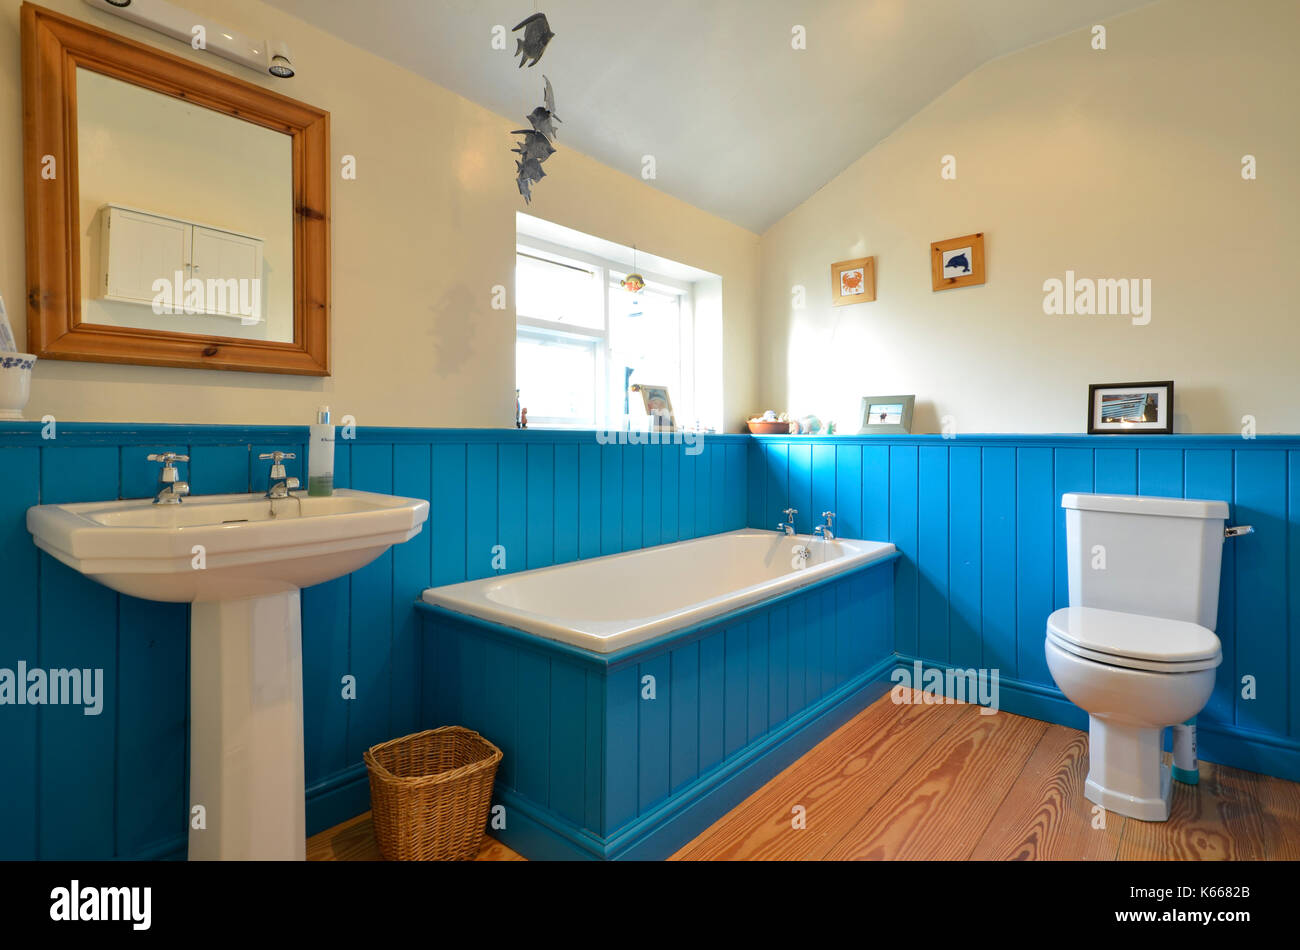 Shower Enclosure Stock Photos & Shower Enclosure Stock Images - Alamy